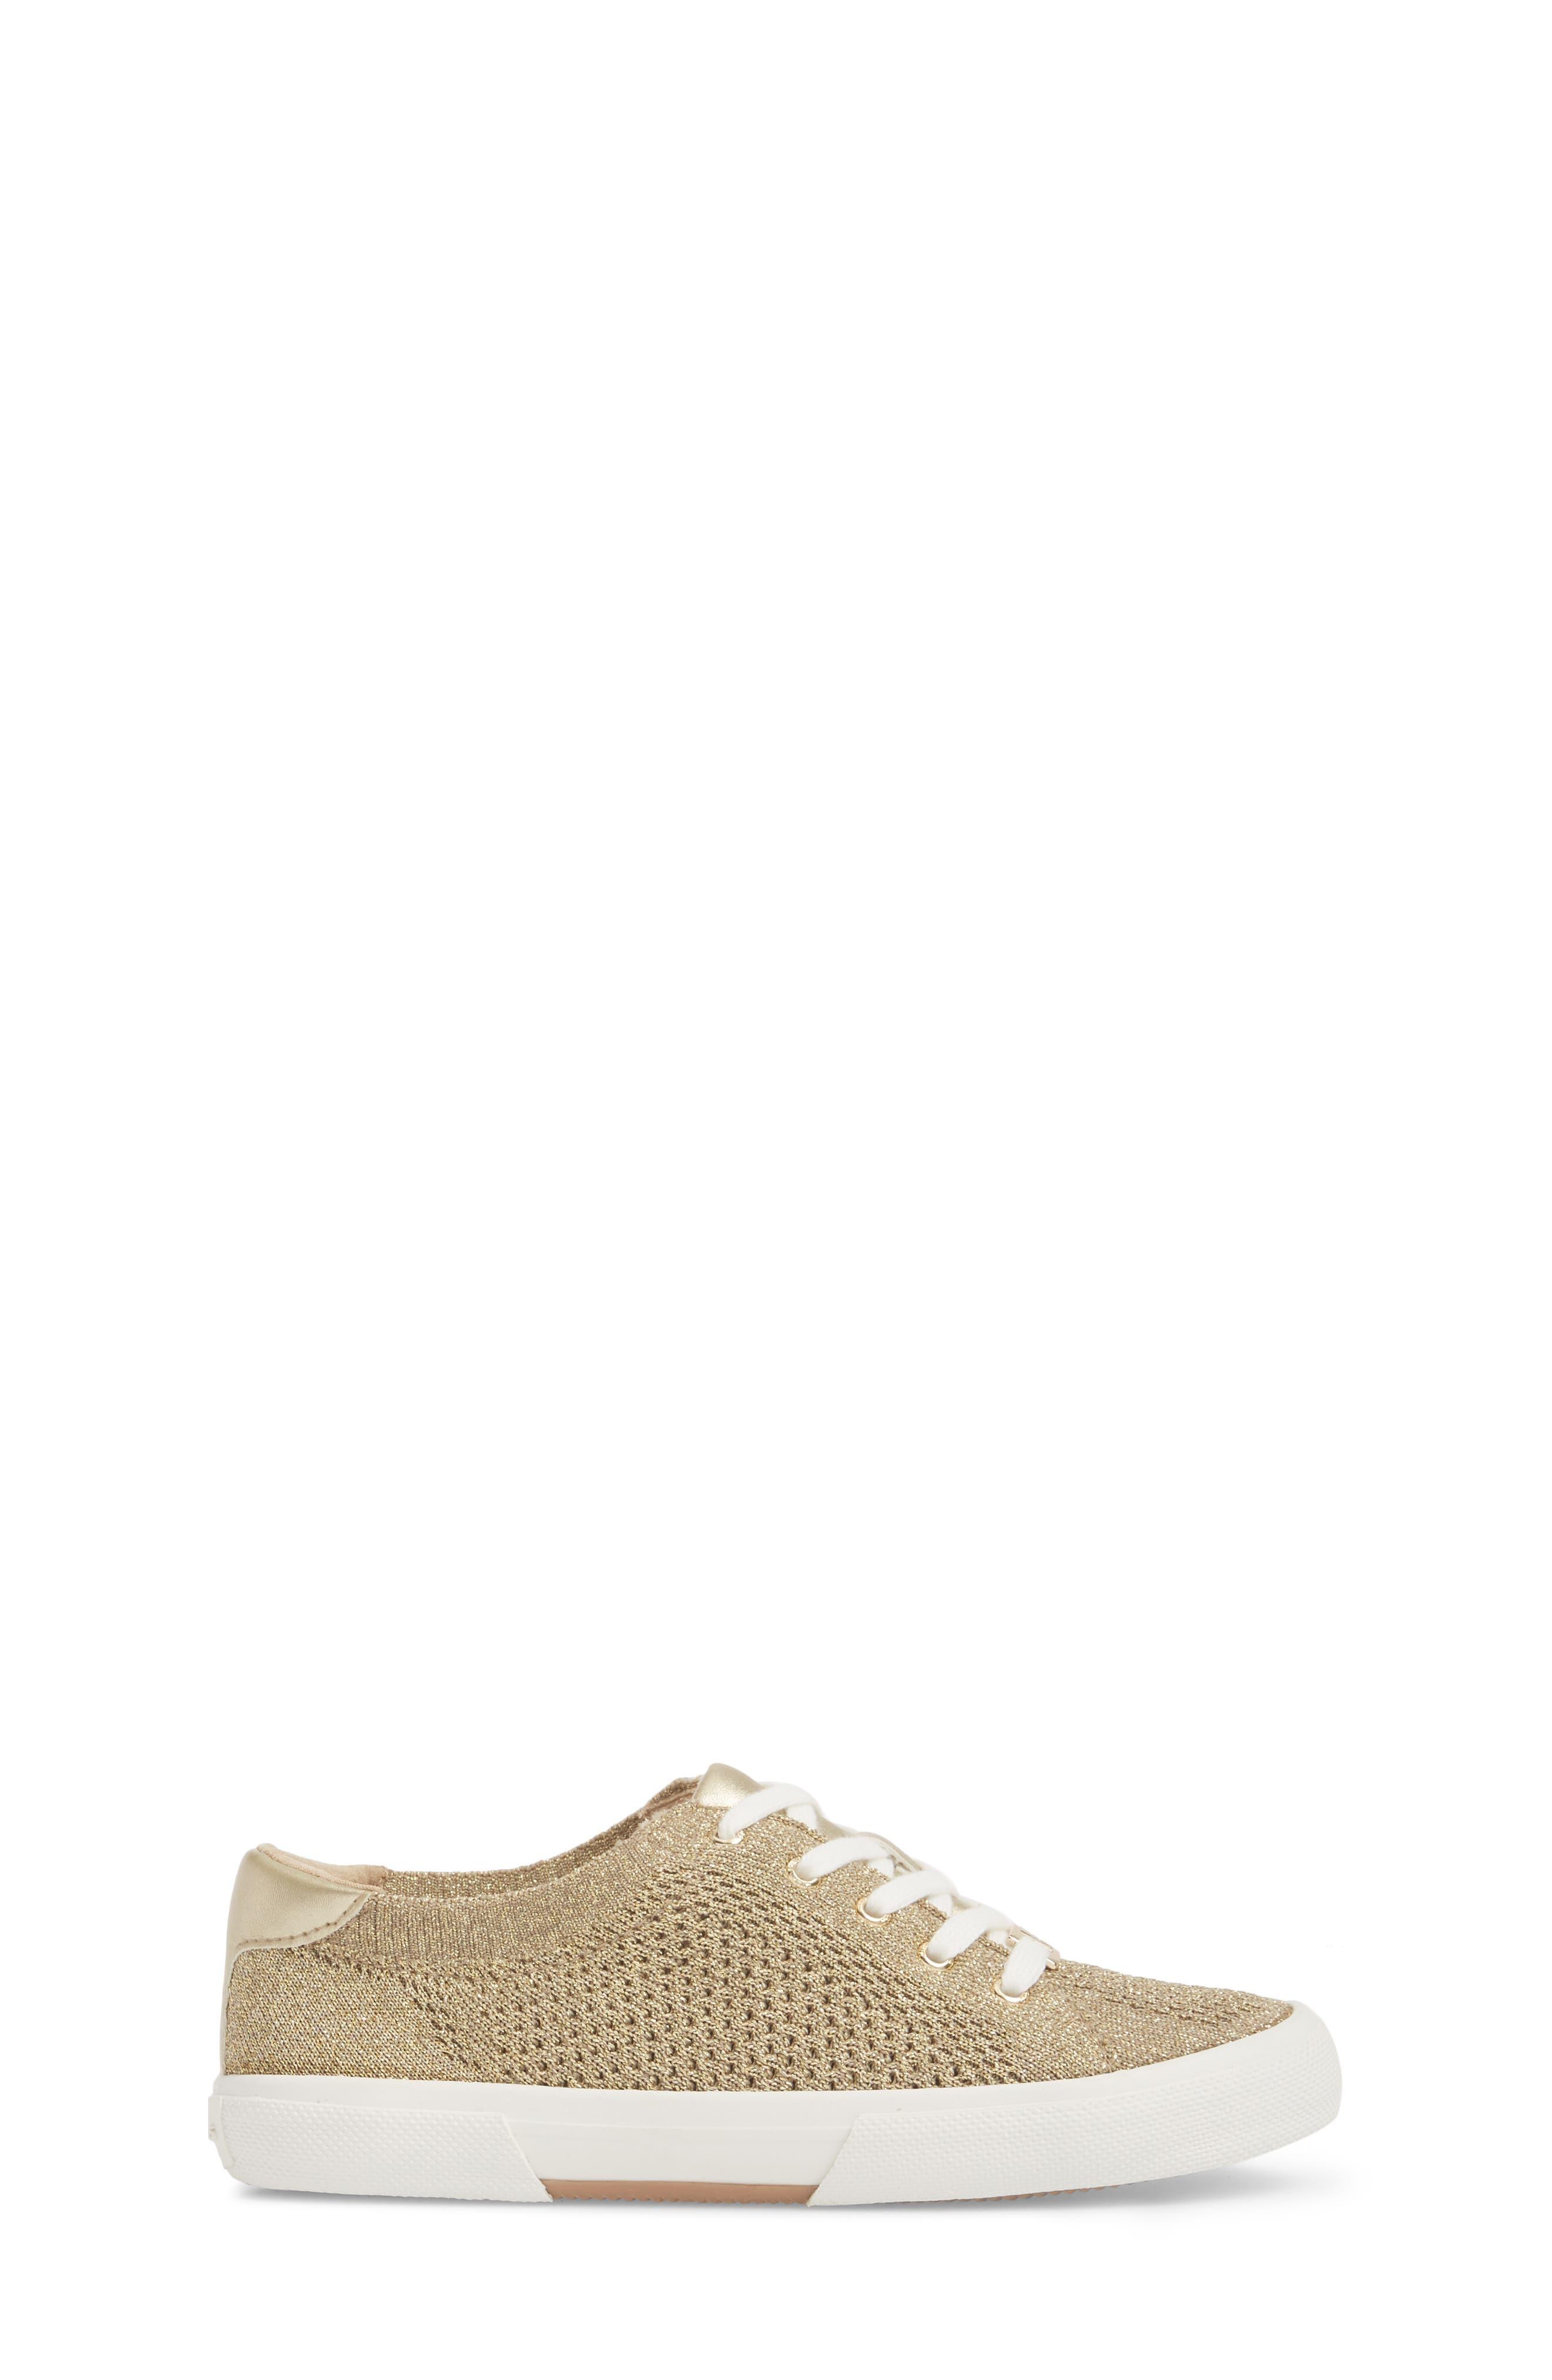 Ima Metallic Knit Sneaker,                             Alternate thumbnail 3, color,                             Gold